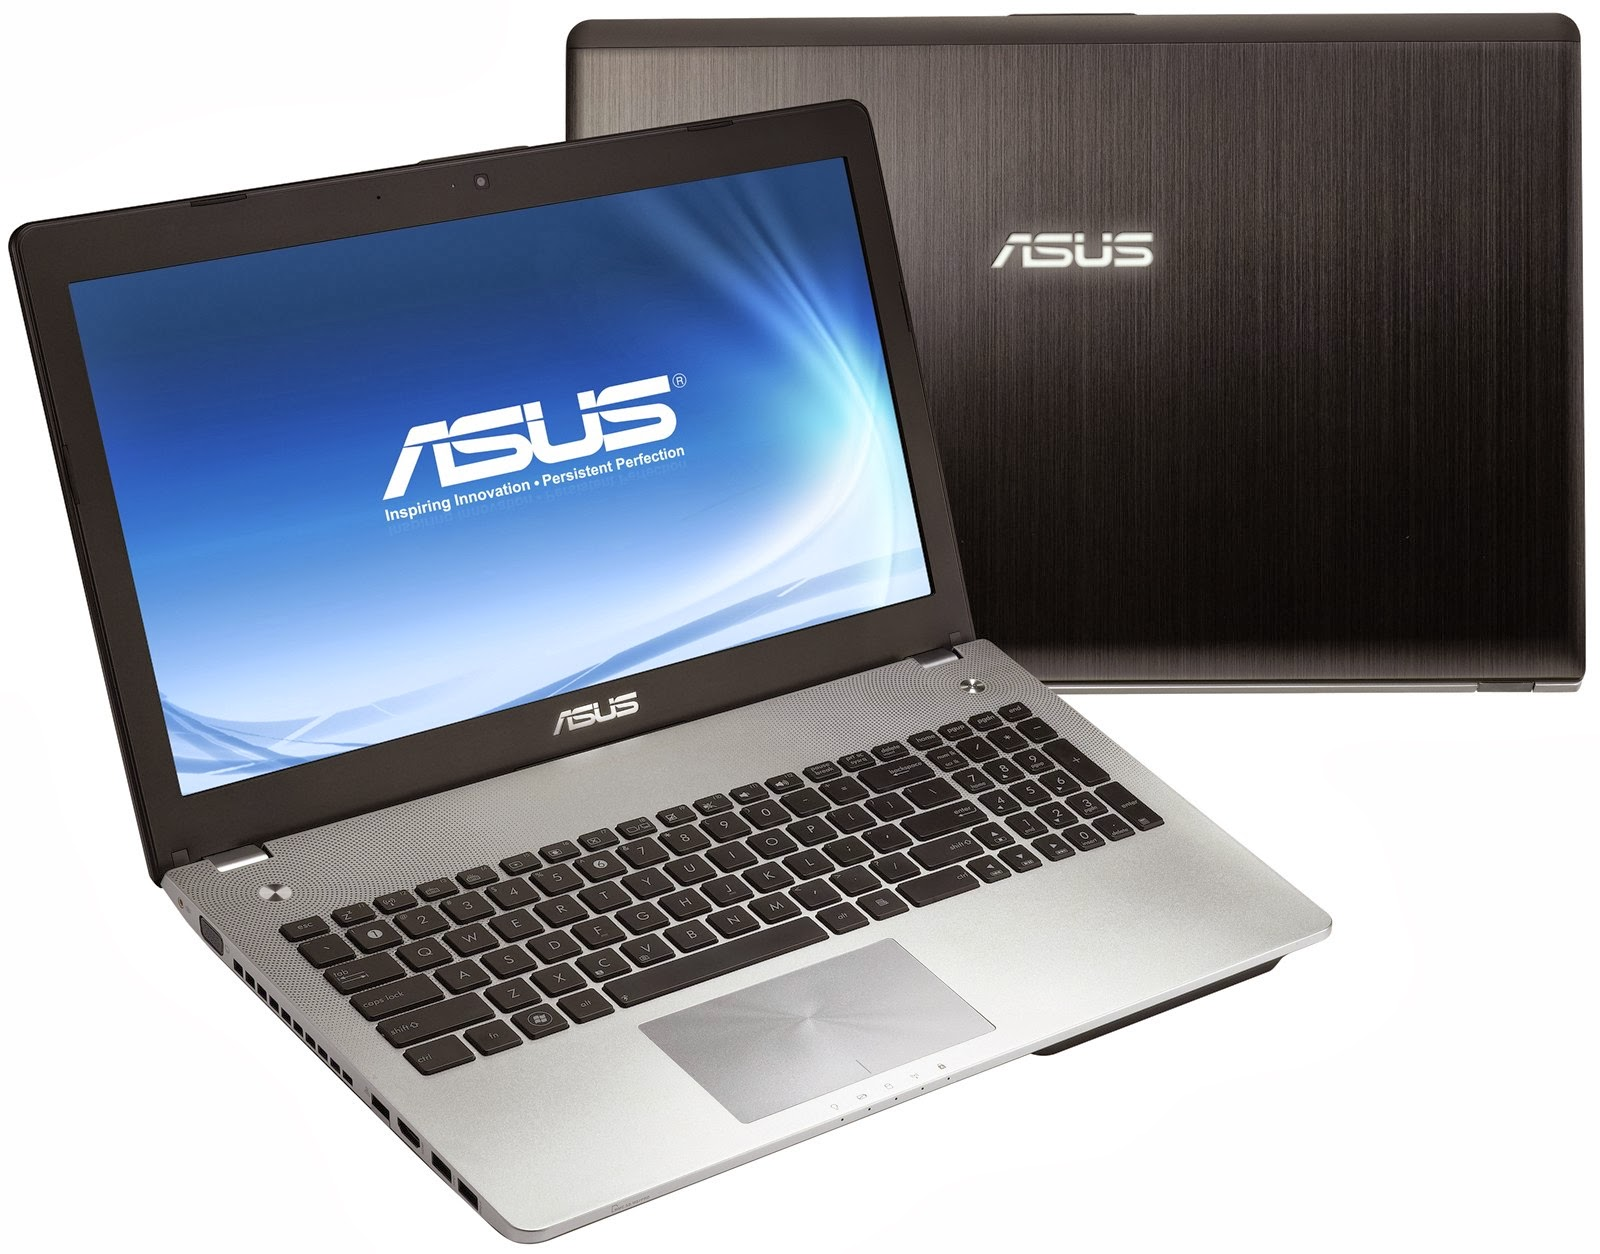 Asus laptop model